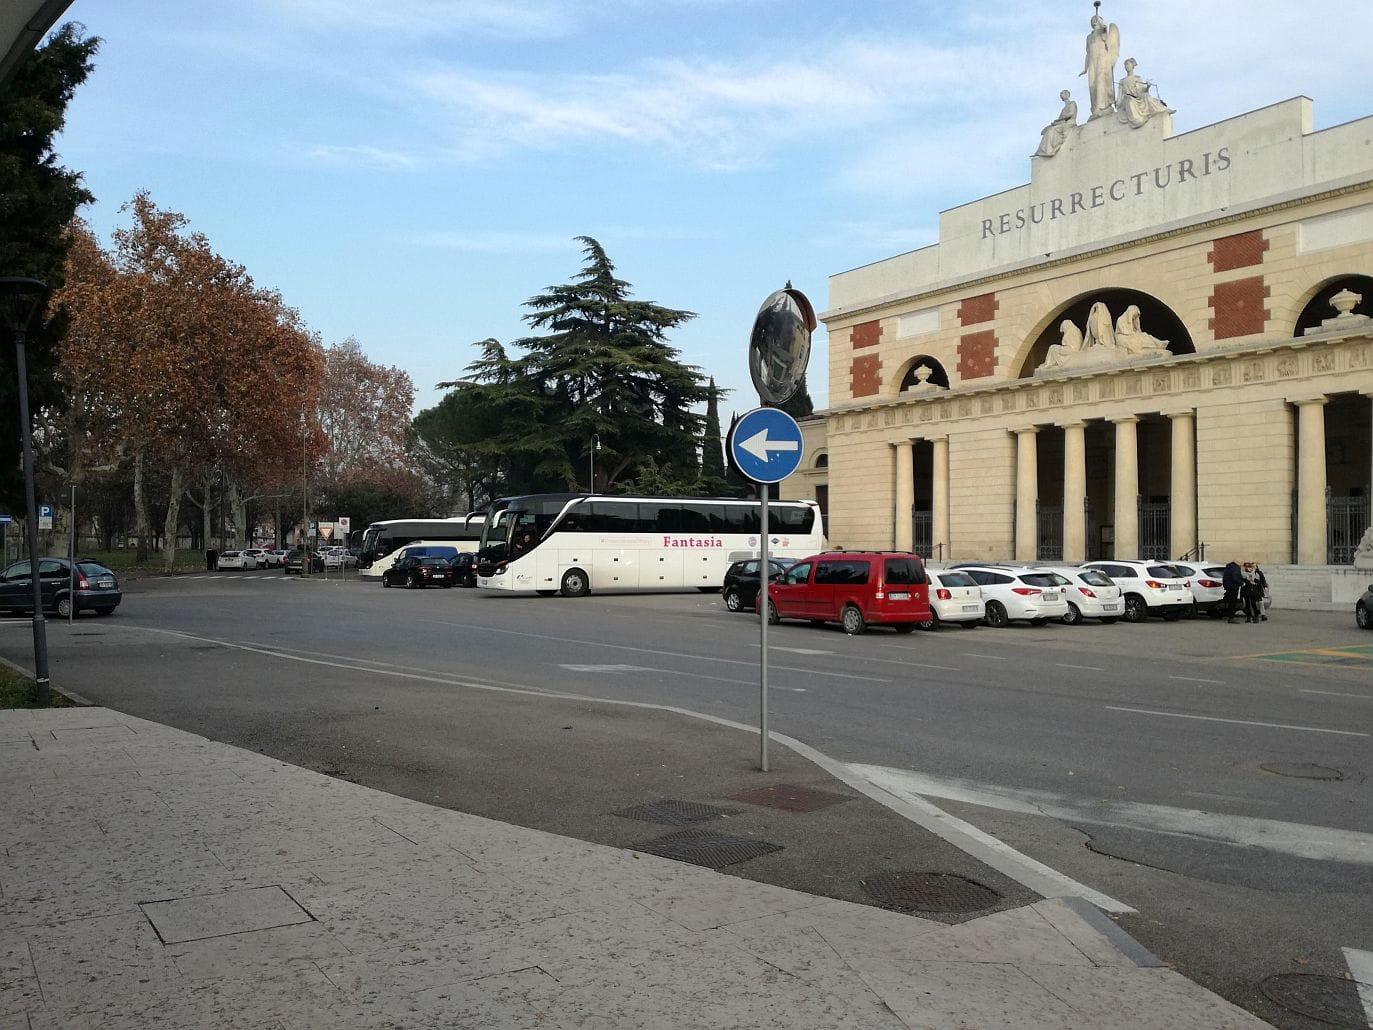 bus-turistico-cimitero-2